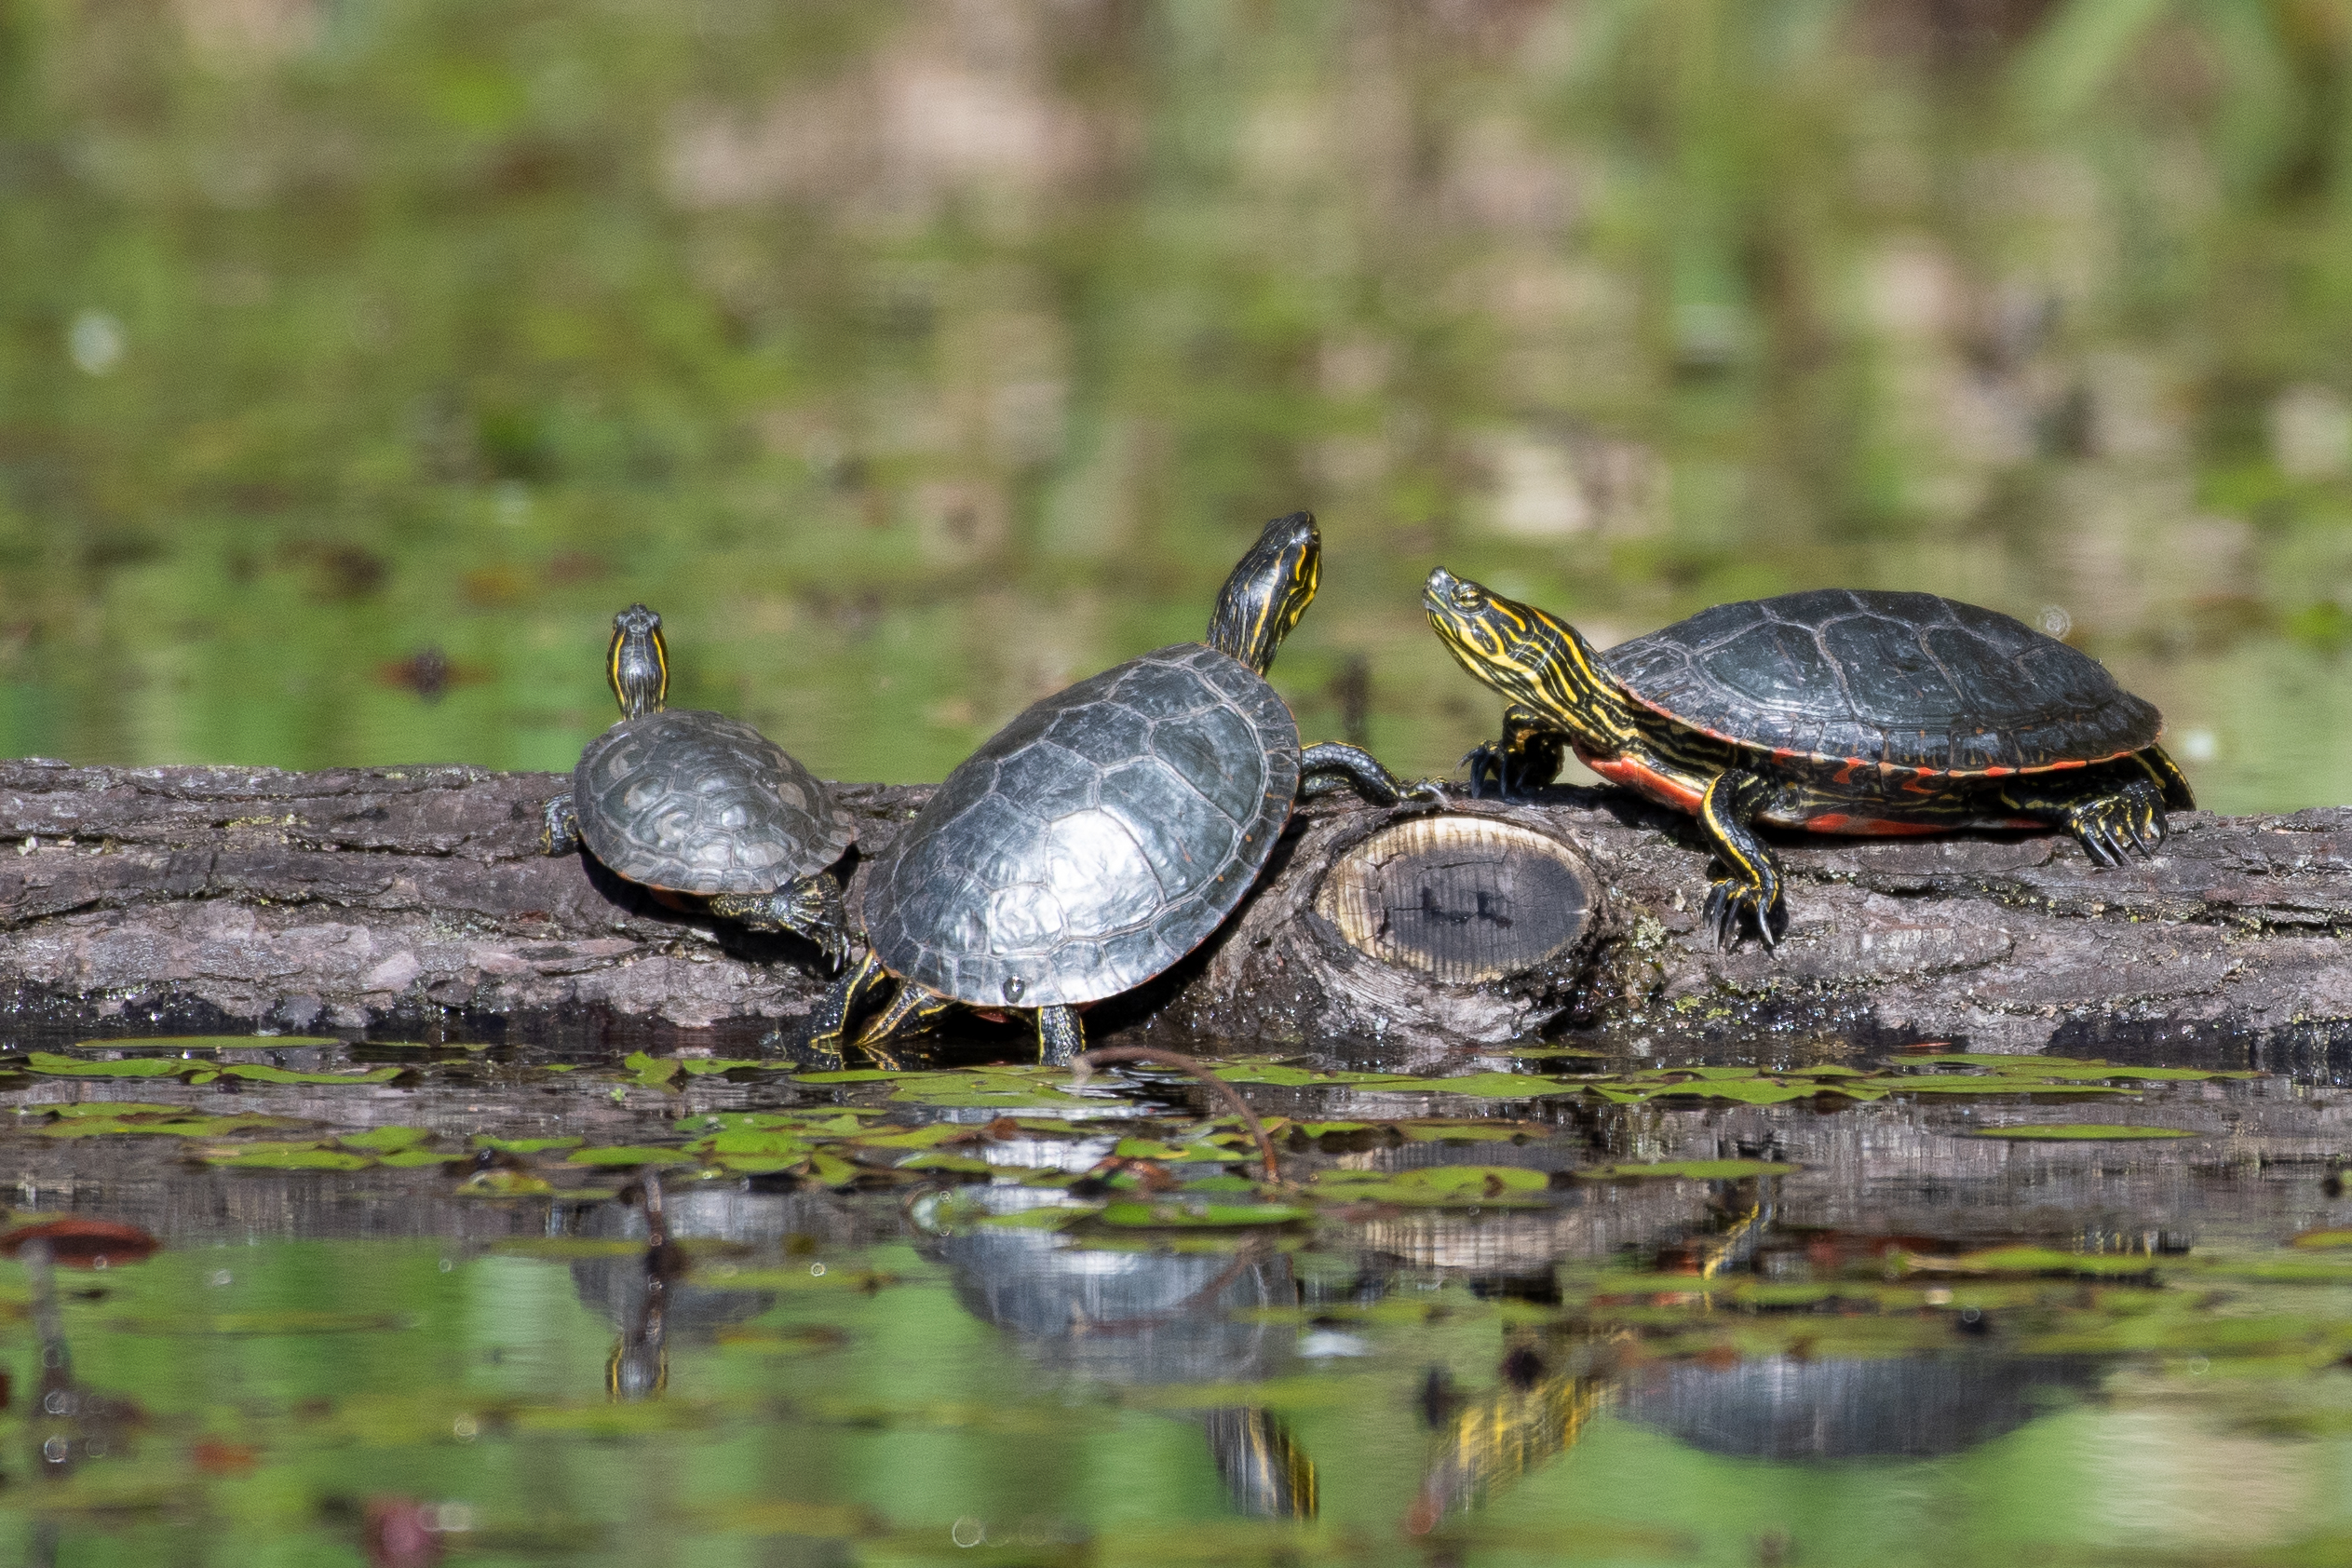 South Coast Western Painted Turtles @ Zoom